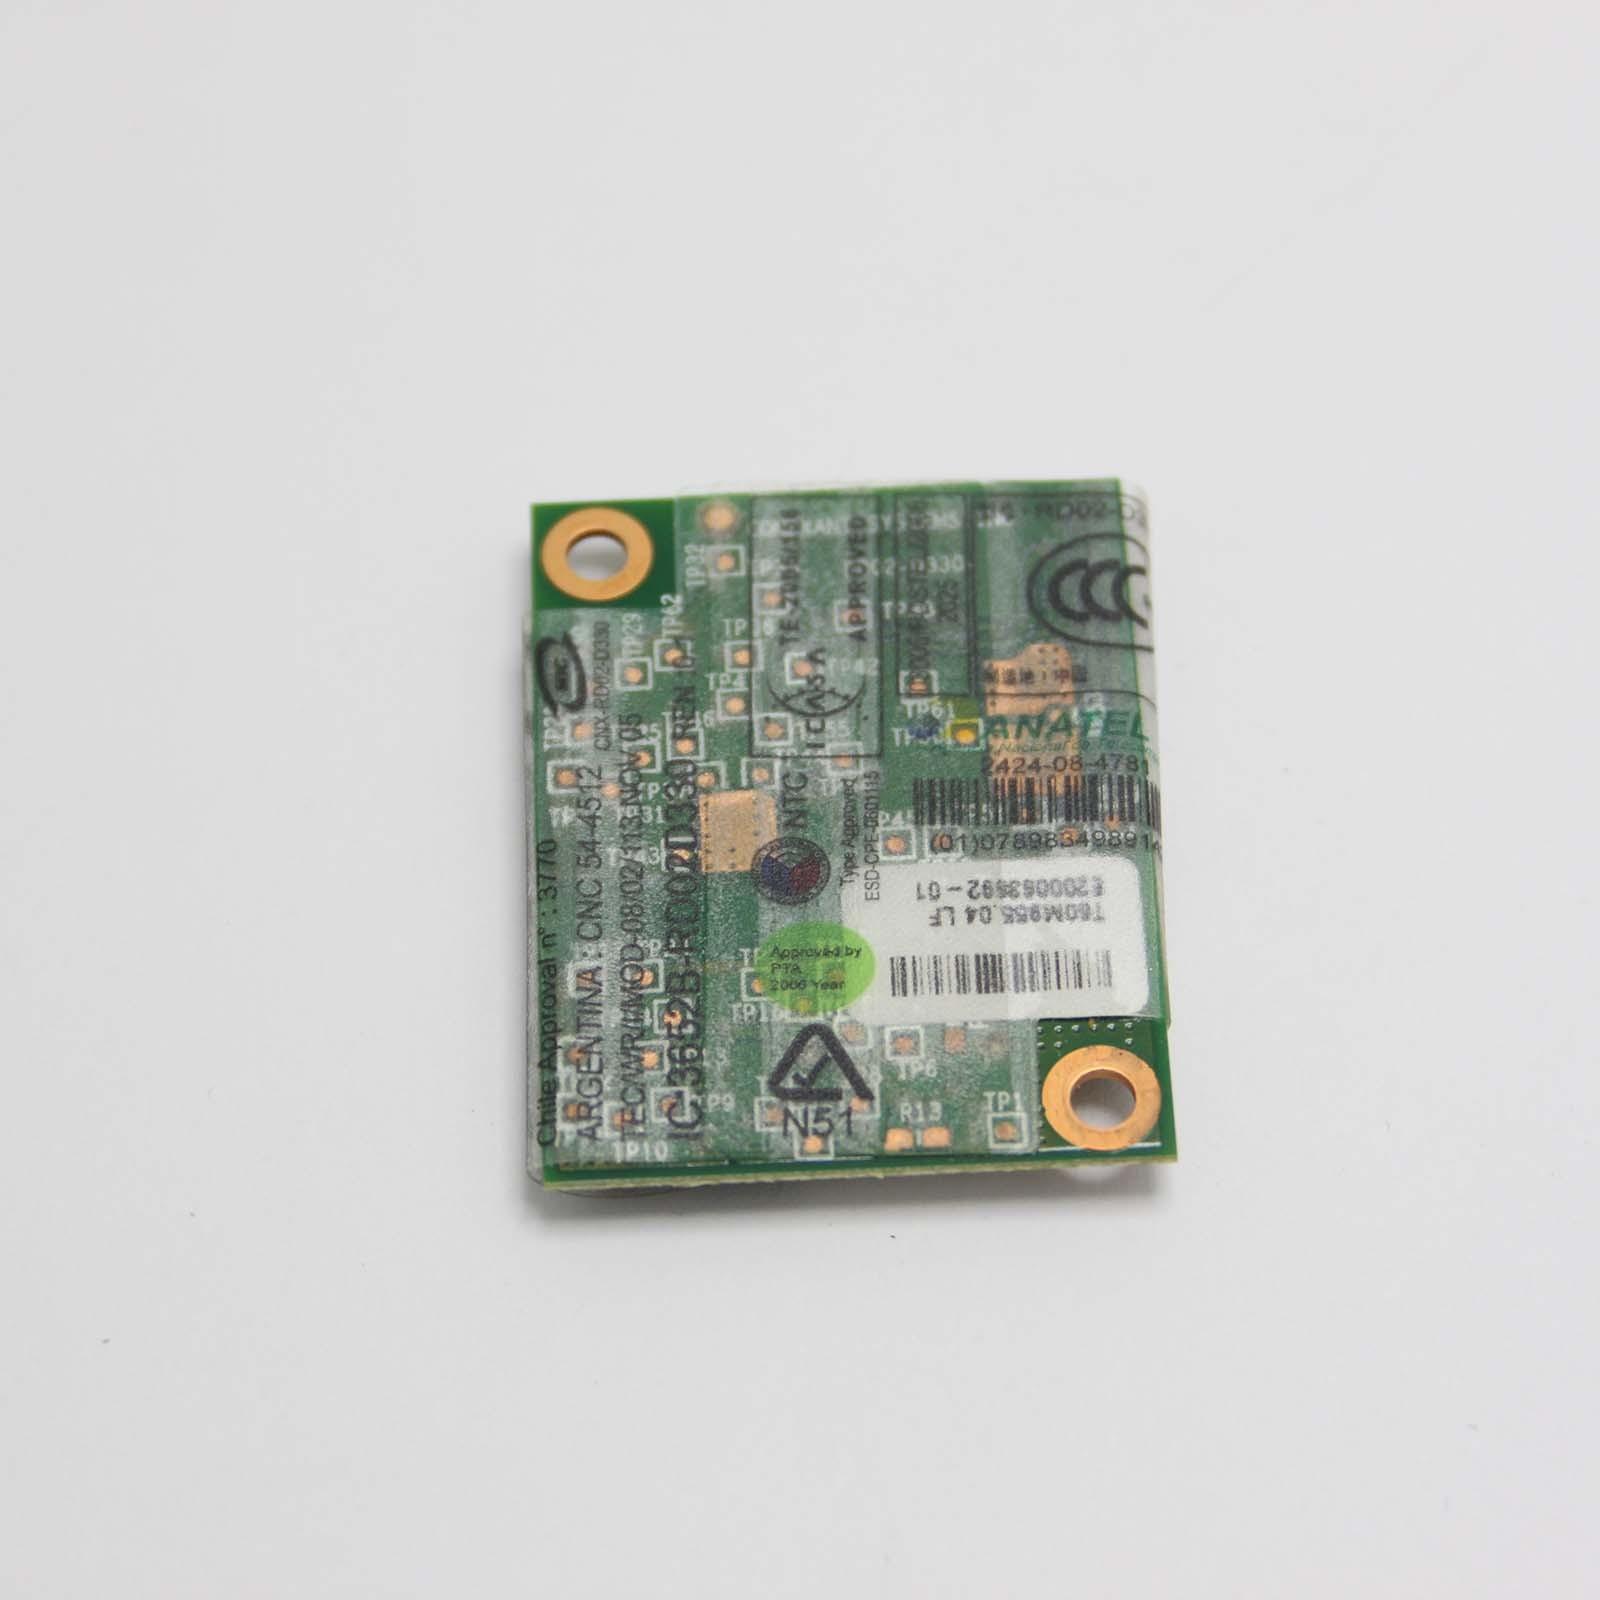 Modem Packard Bell Easynote TJ65 MS2273